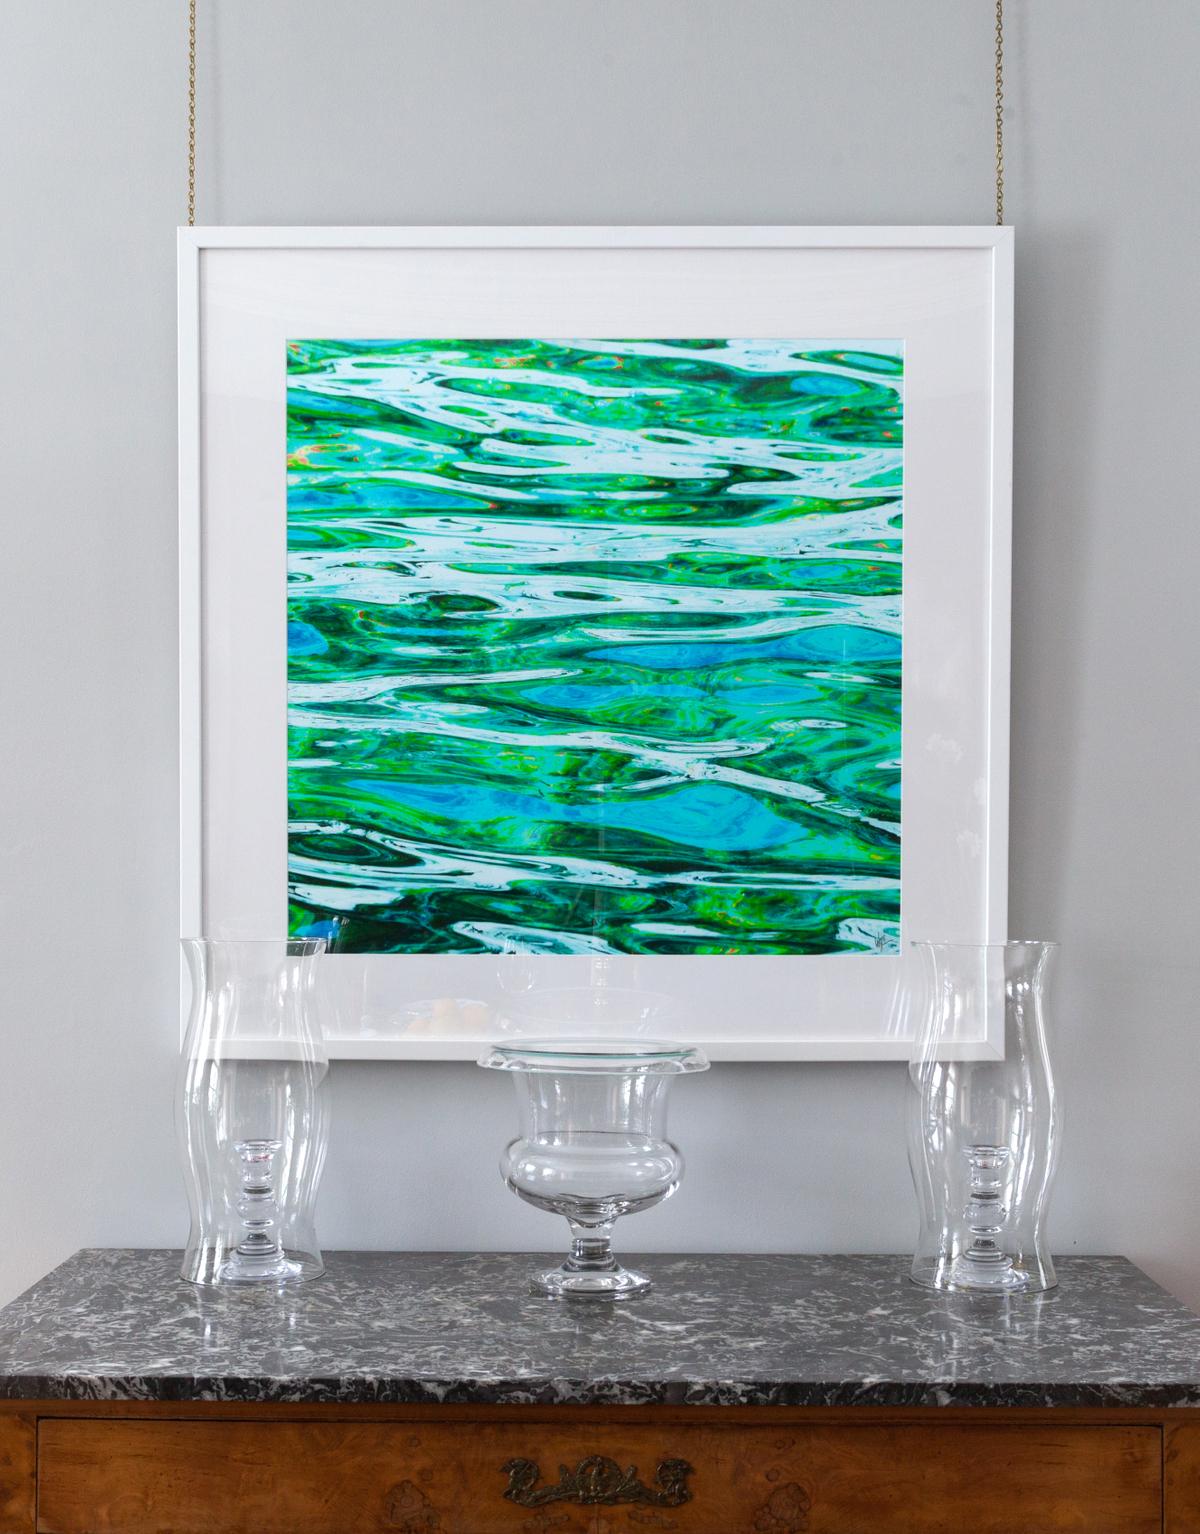 WATER REFLECTIONS No. 4